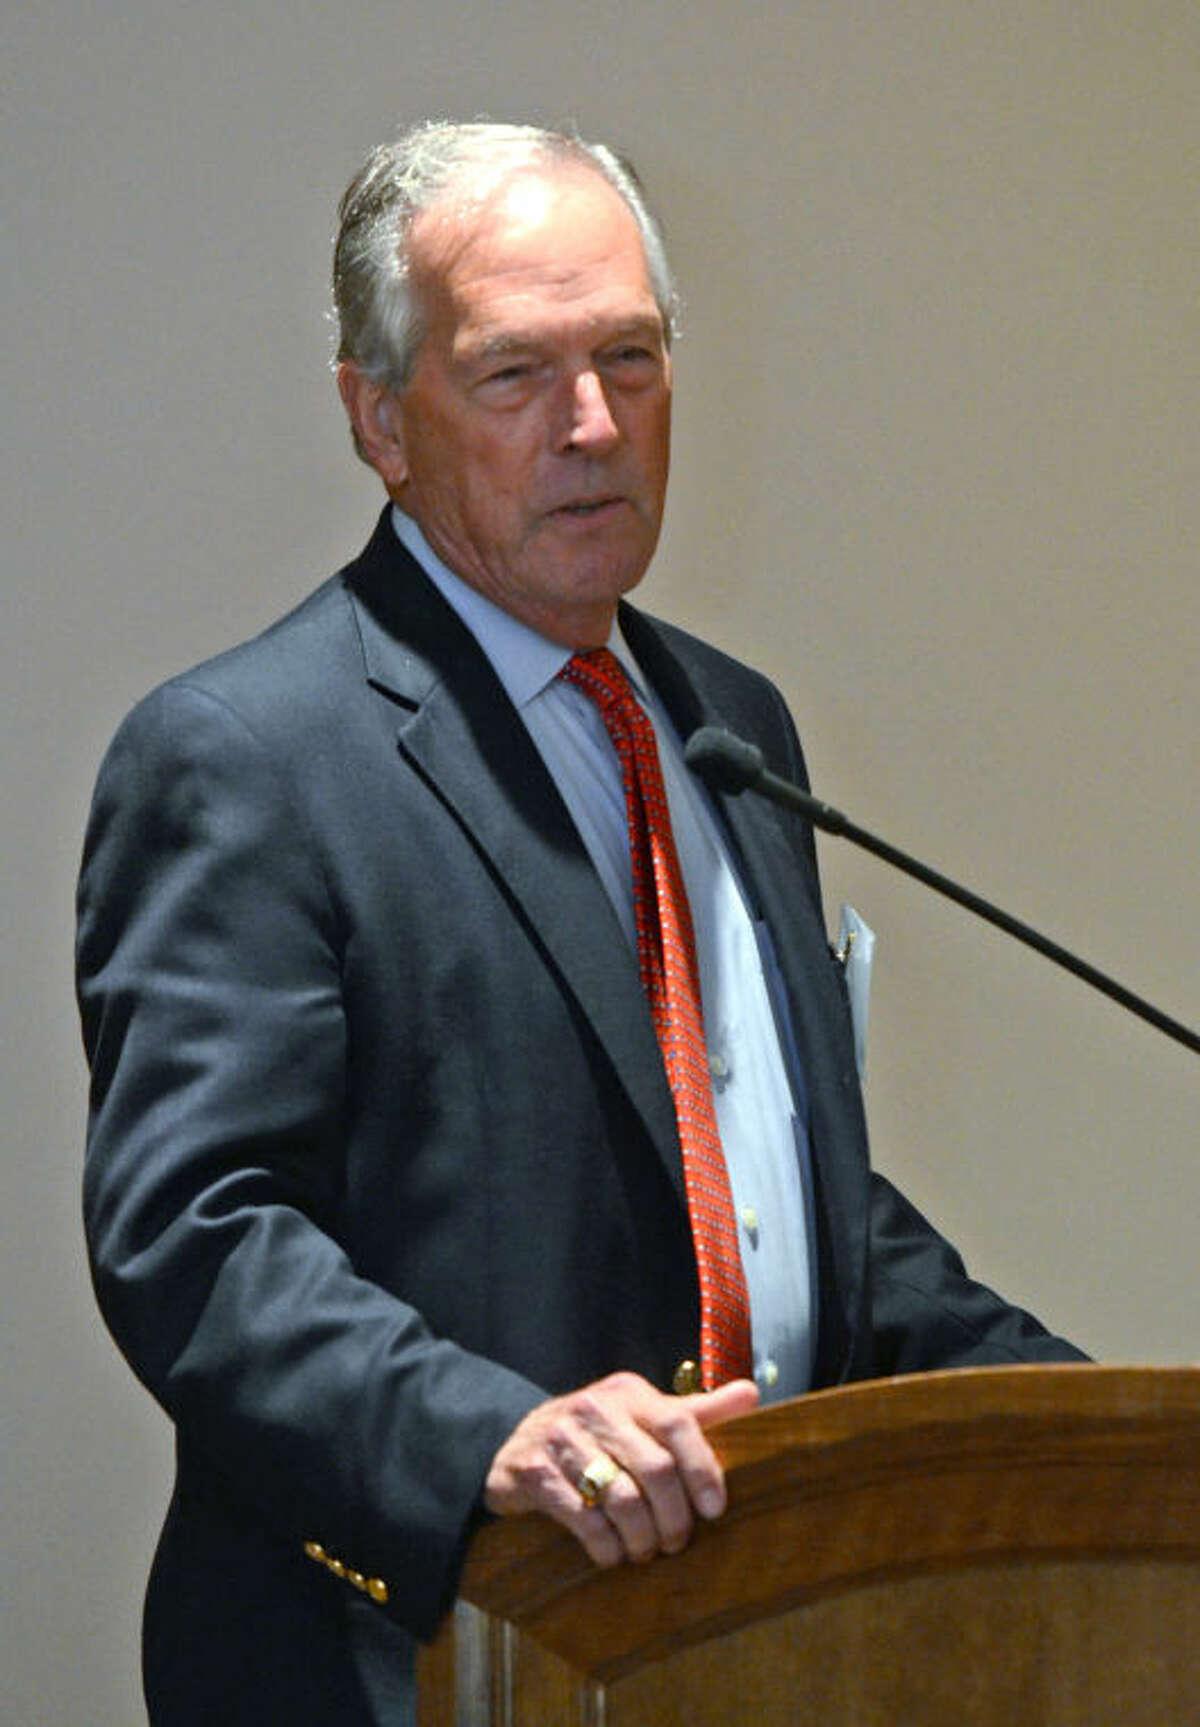 Don Evans, former secretary of commerce under Pres. George W. Bush, speaks during the Permian Basin Petroleum Association's monthly membership luncheon Thursday at the Petroleum Club. James Durbin/Reporter-Telegram